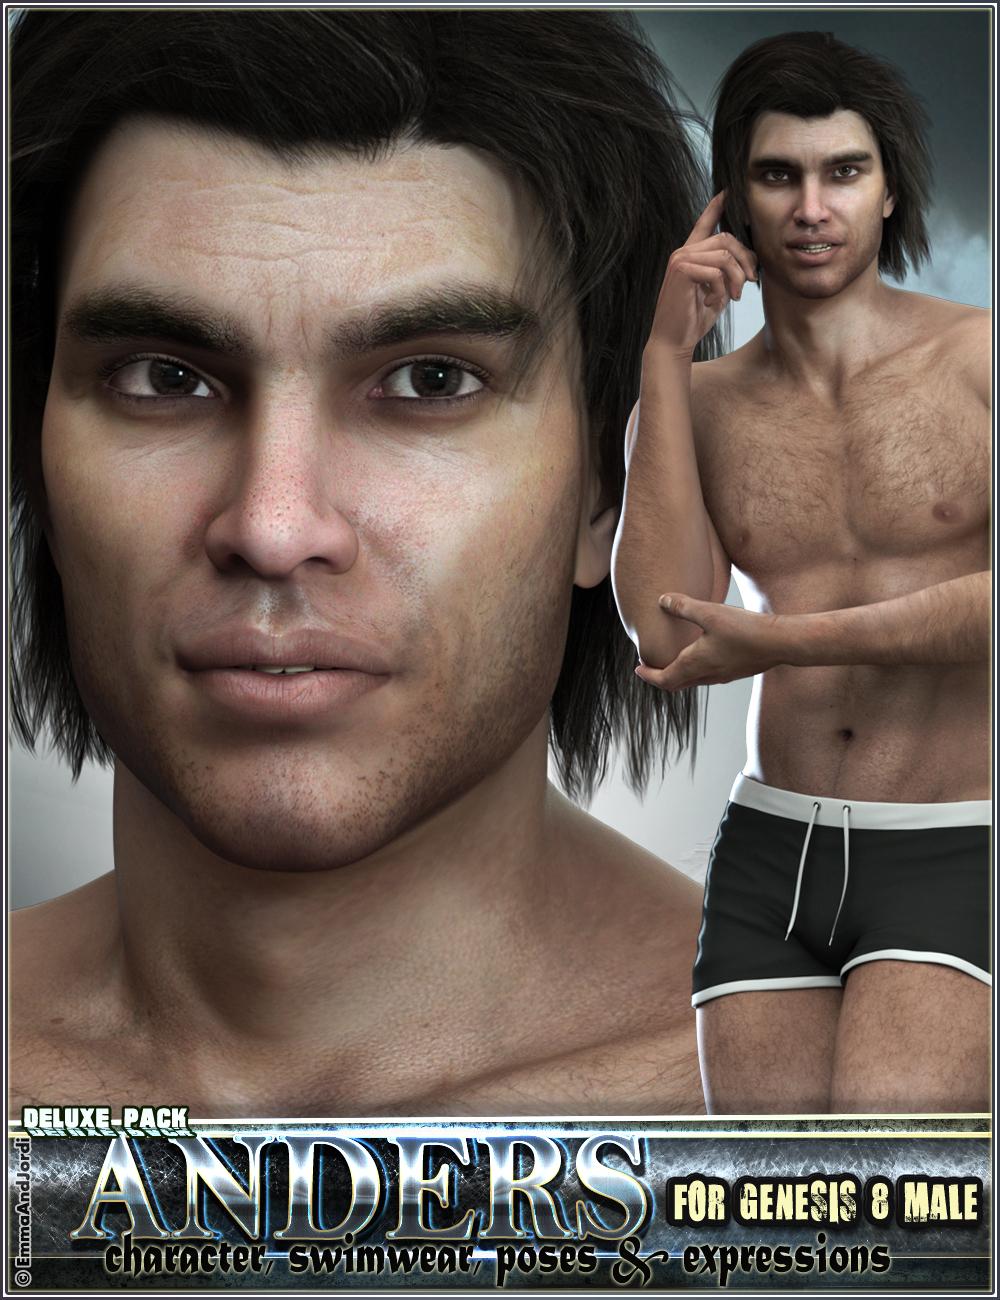 EJ Anders Deluxe Pack for Genesis 8 Male by: EmmaAndJordi, 3D Models by Daz 3D